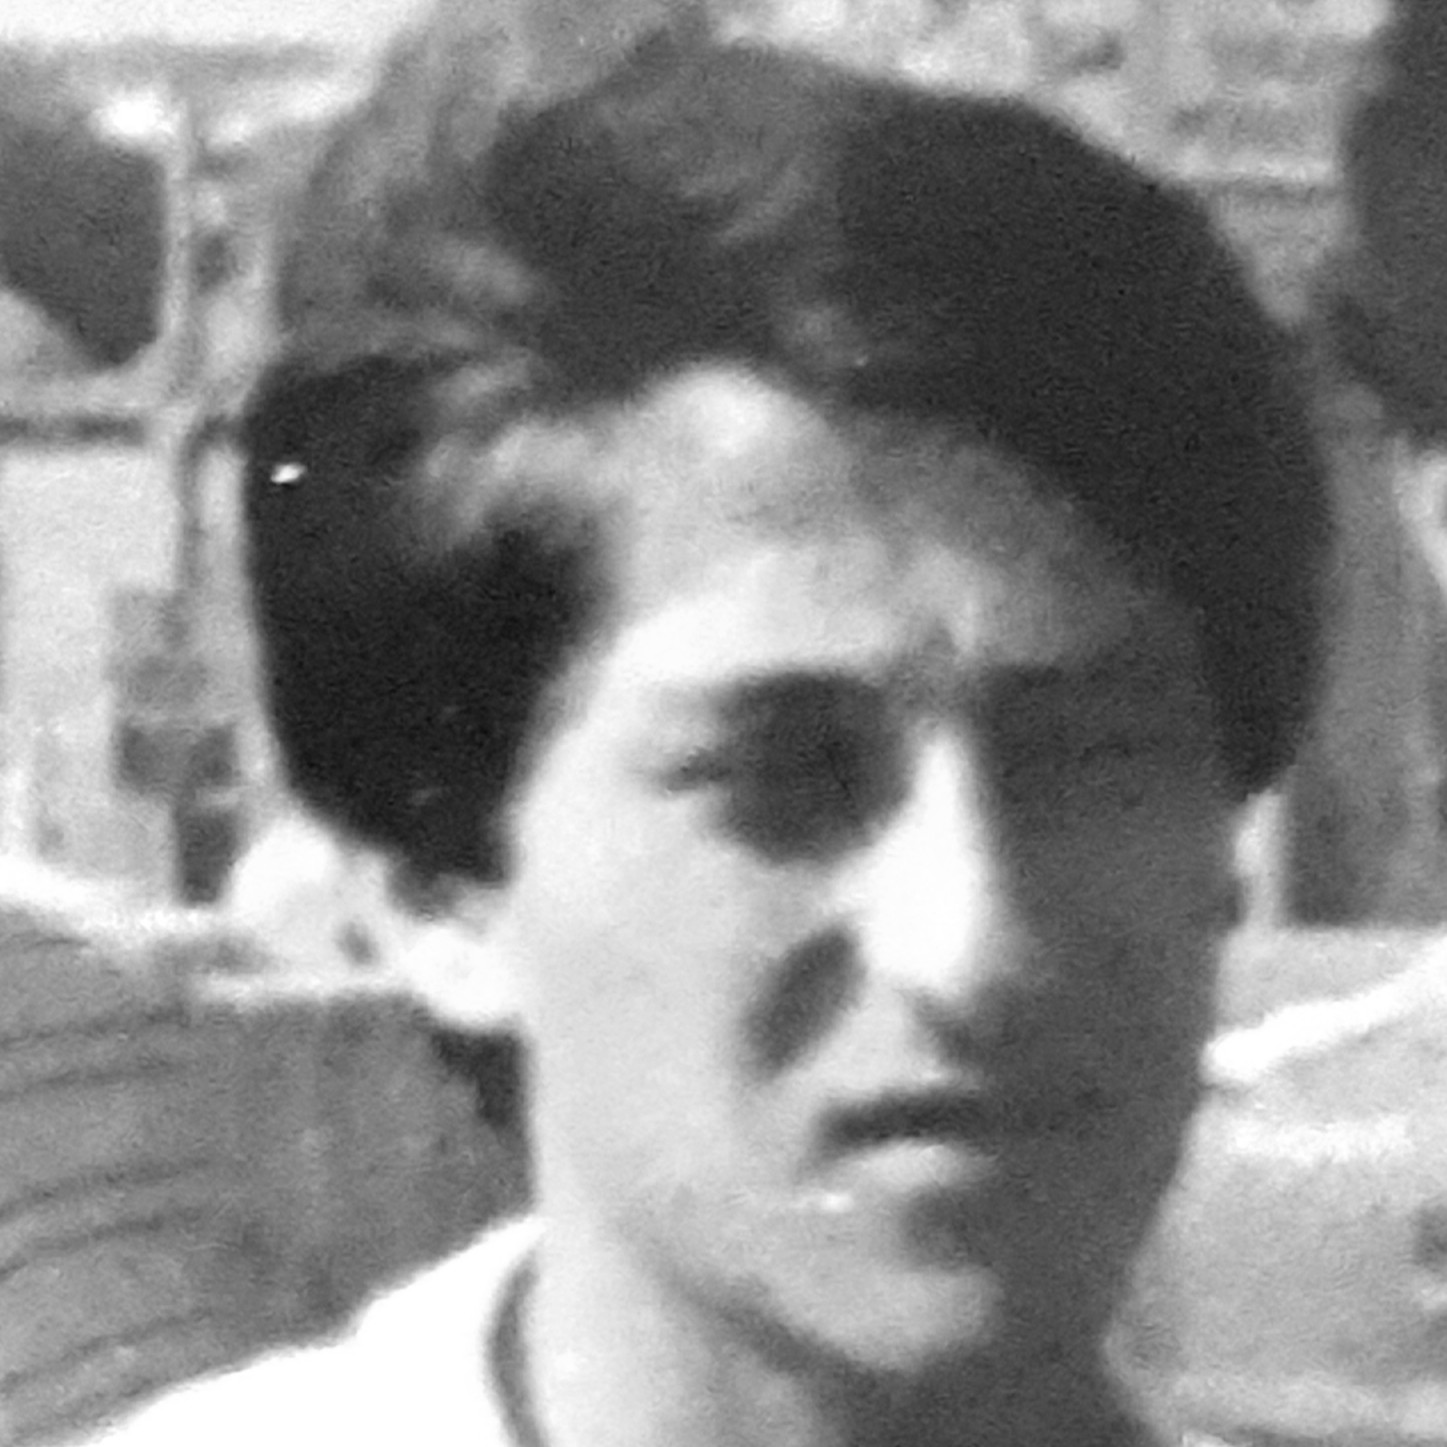 Hasan Numan